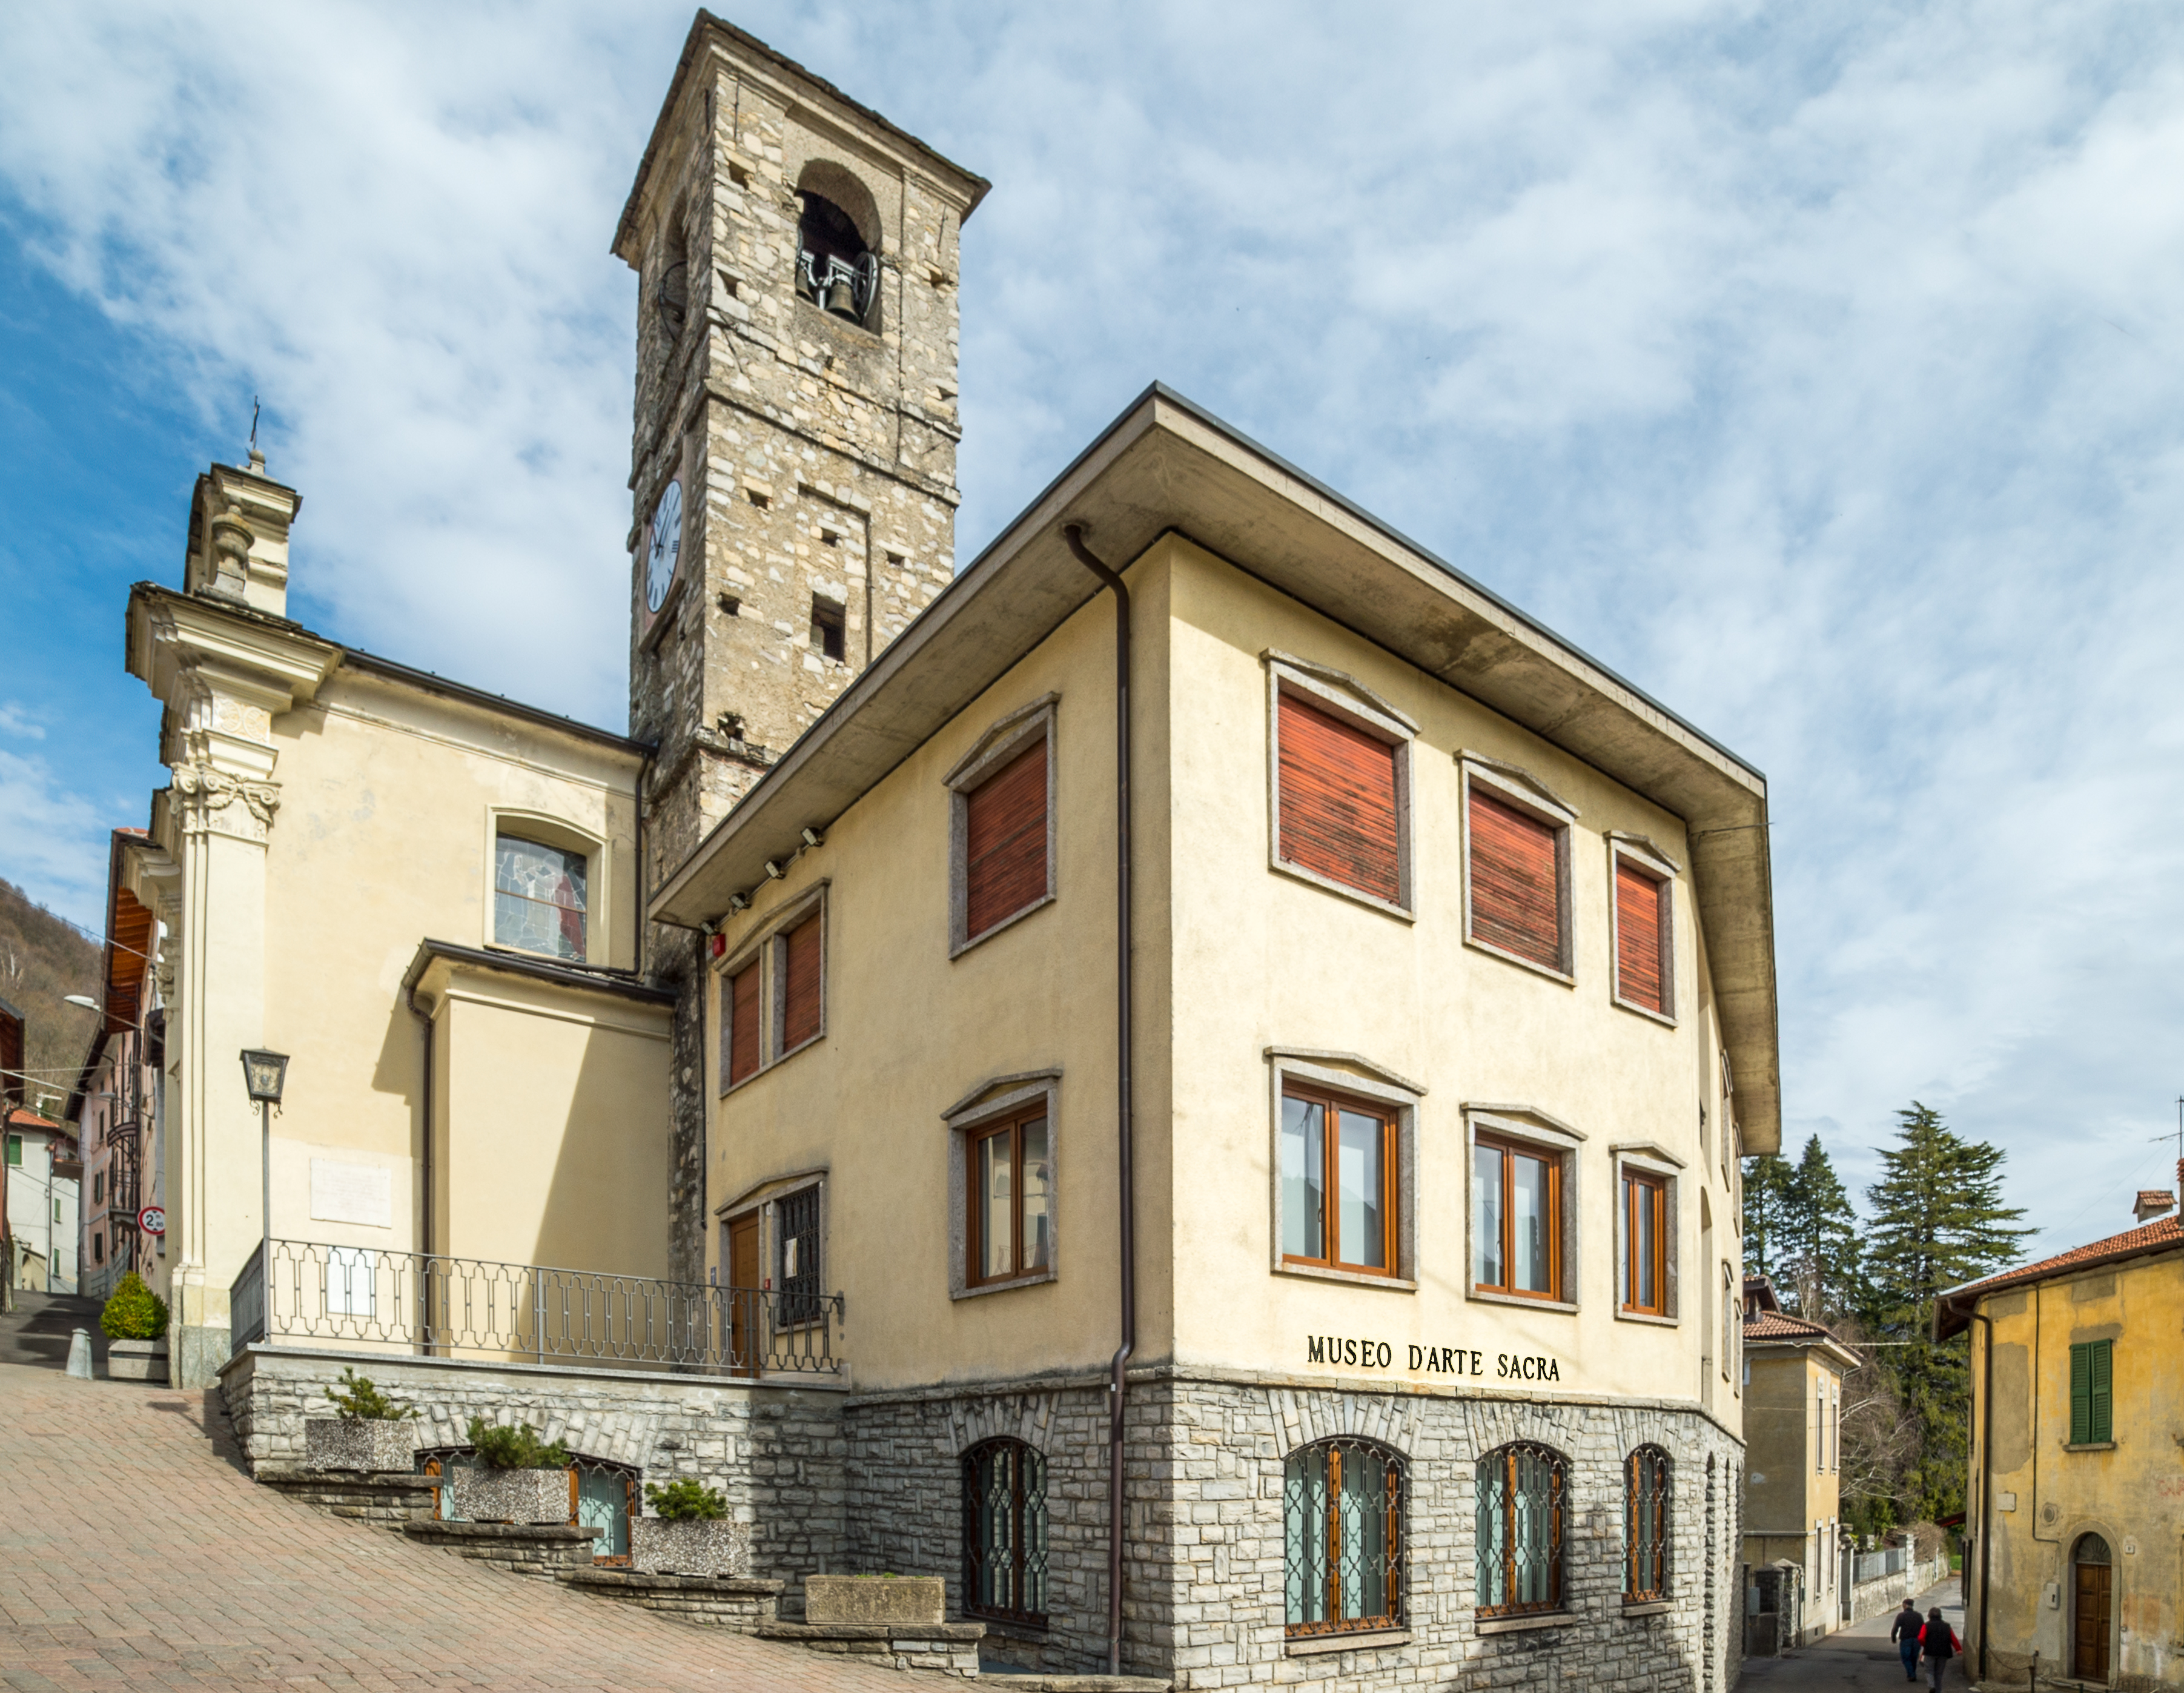 MUSEO D'ARTE SACRA DI SCARIA: TRA ARTE E CULTURA SI È APERTA LA STAGIONE 2018